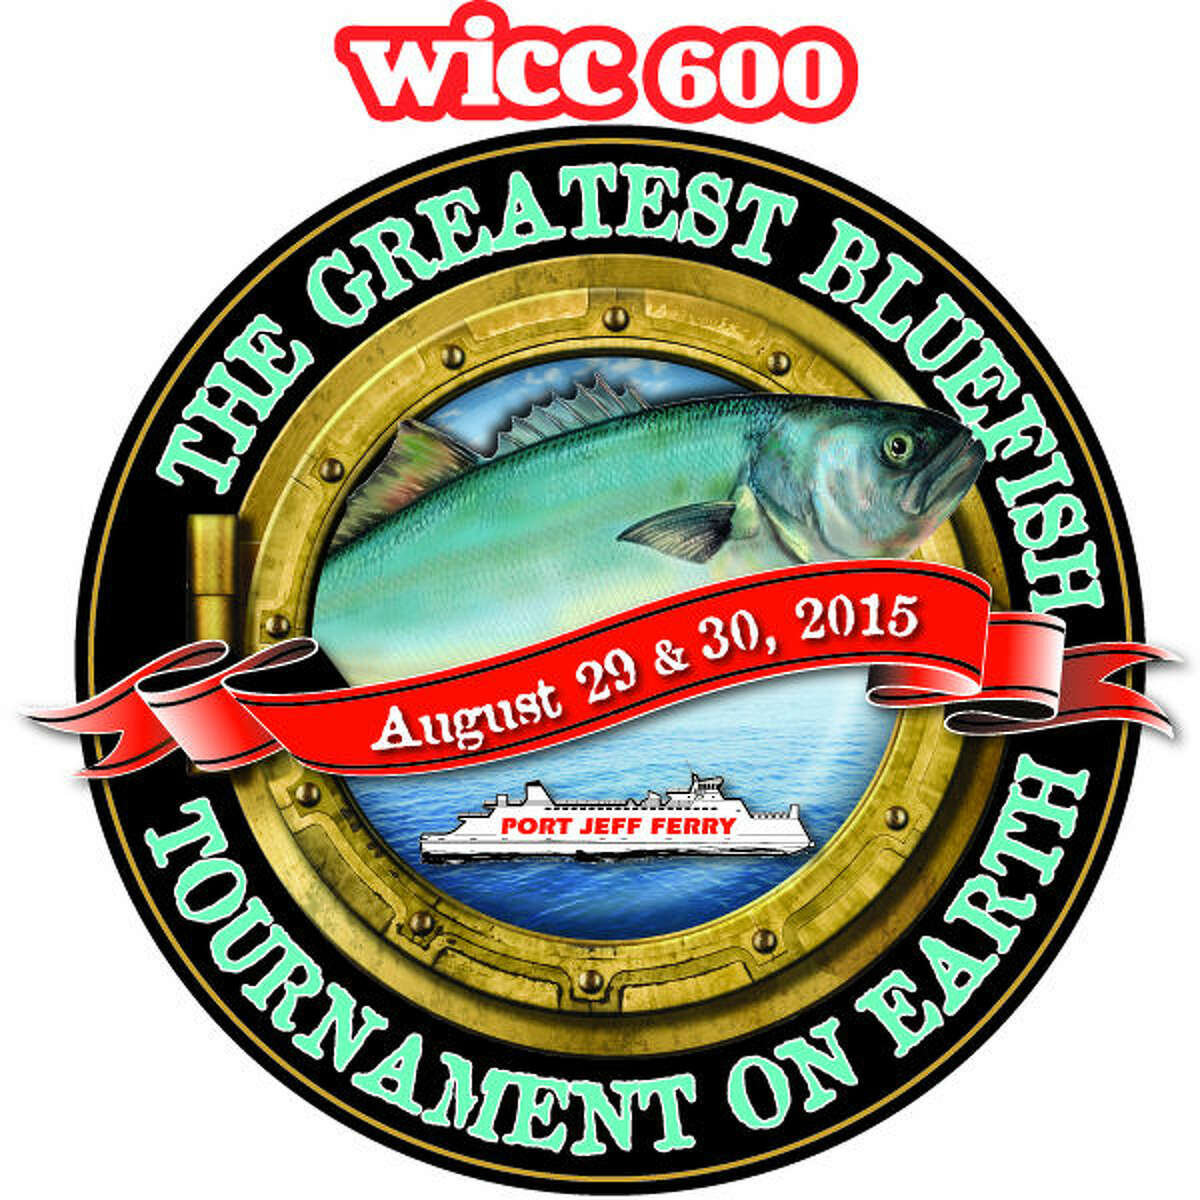 Greatest Bluefish Contest on Earth logo